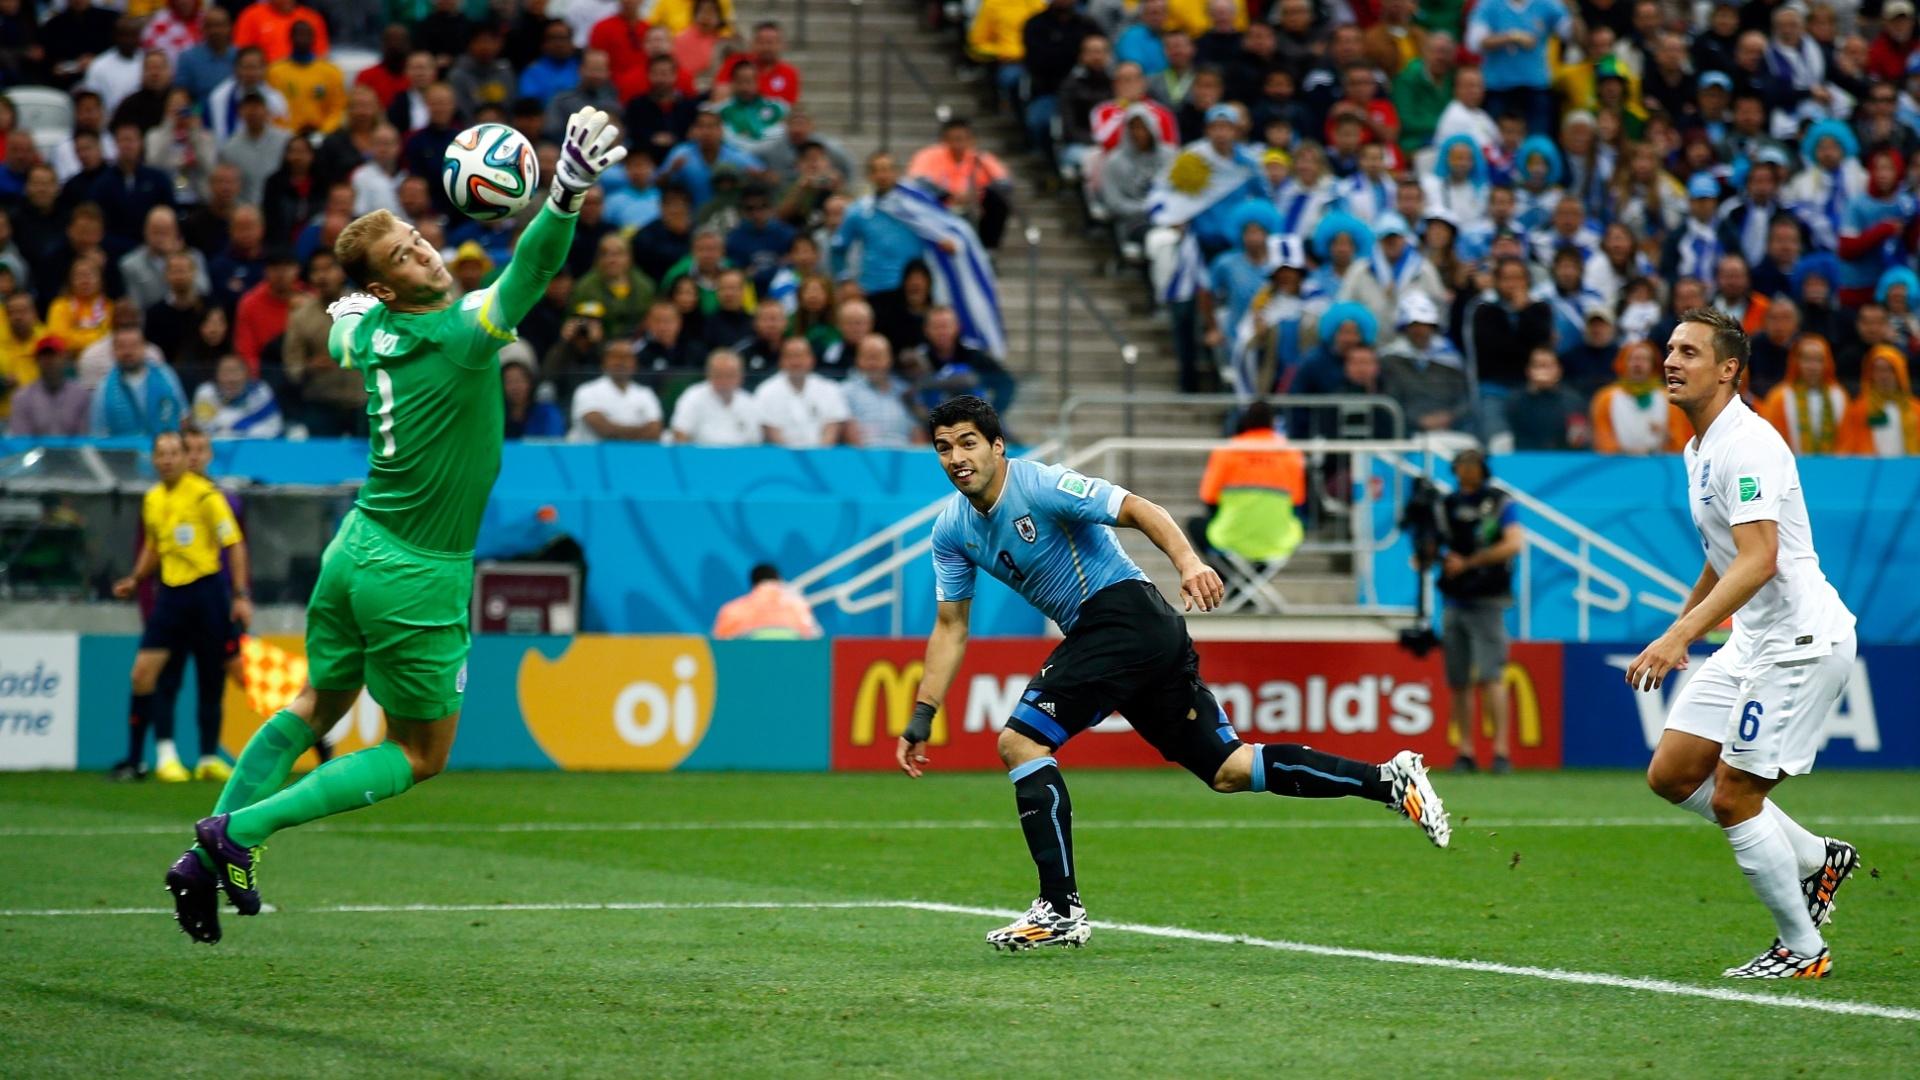 19.jun.2014 - Atacante Luis Suárez recebe cruzamento de Cavani e desvia de cabeça para colocar o Uruguai na frente do placar contra a Inglaterra